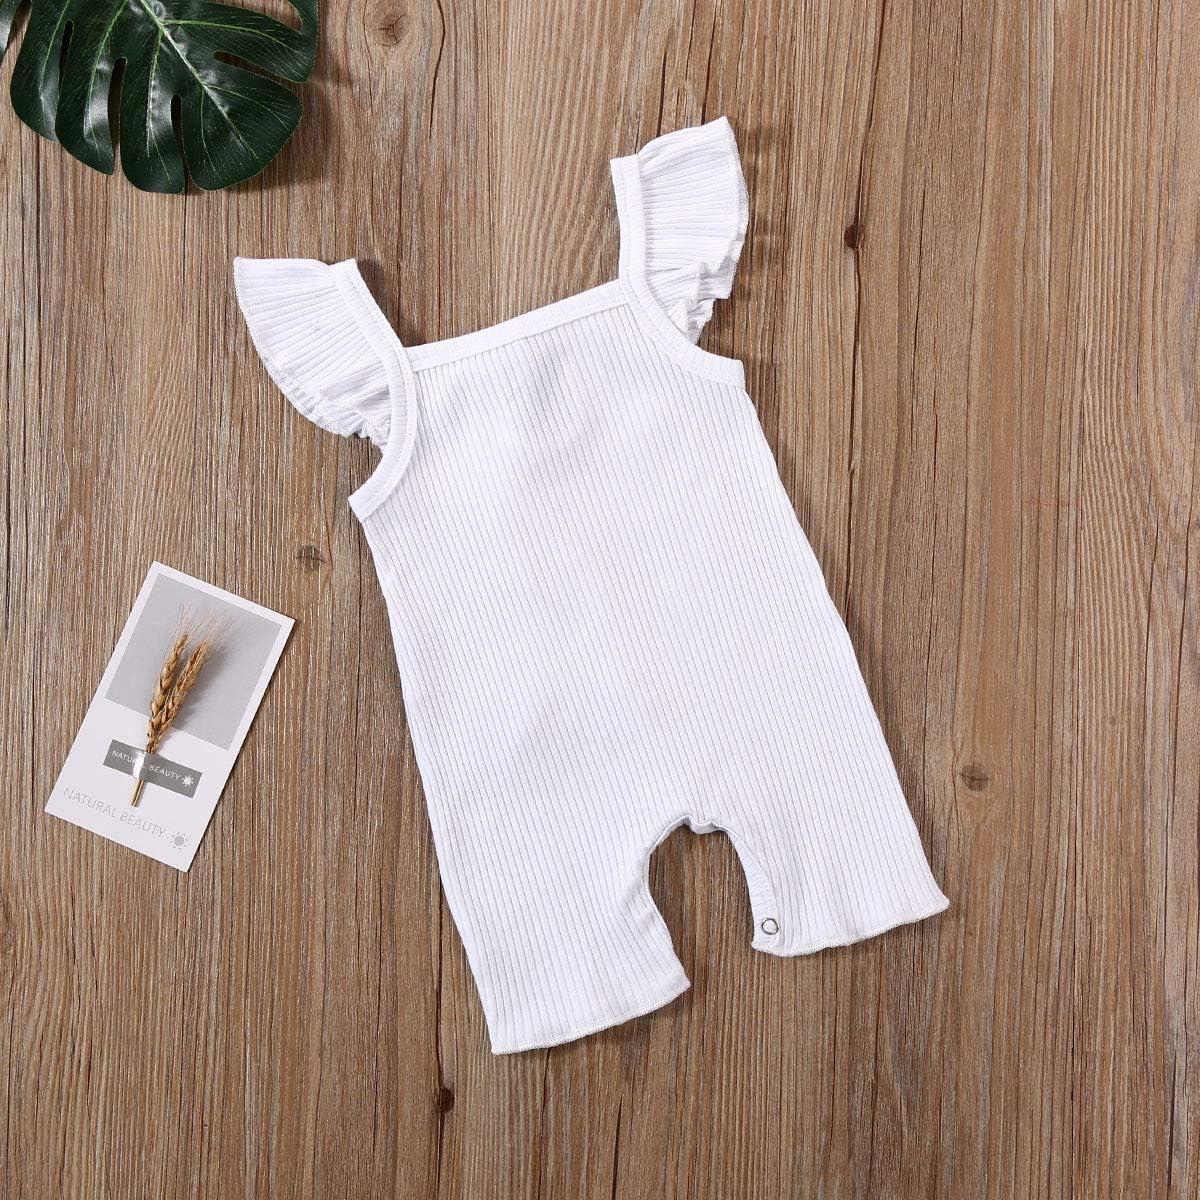 Lamuusaa Baby Girls Boys One Piece Cotton Romper Solid Color Sleeveless Jumpsuit Bodysuit Pajamas Summer Clothes 0-24M